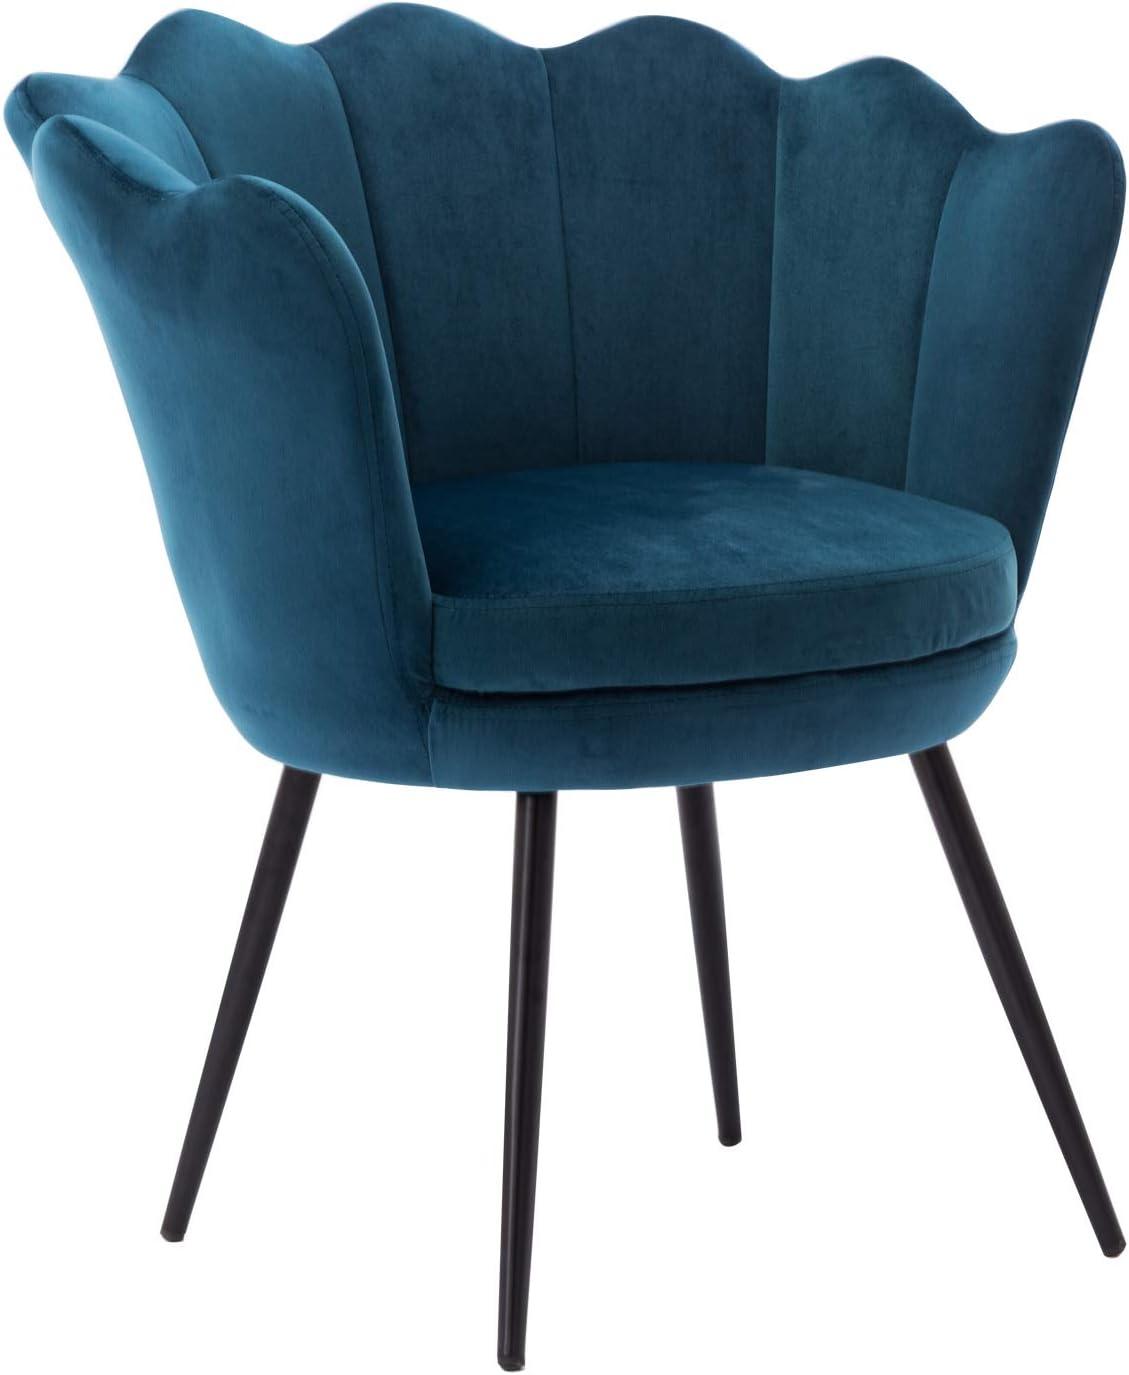 Wahson Velvet Accent Chair